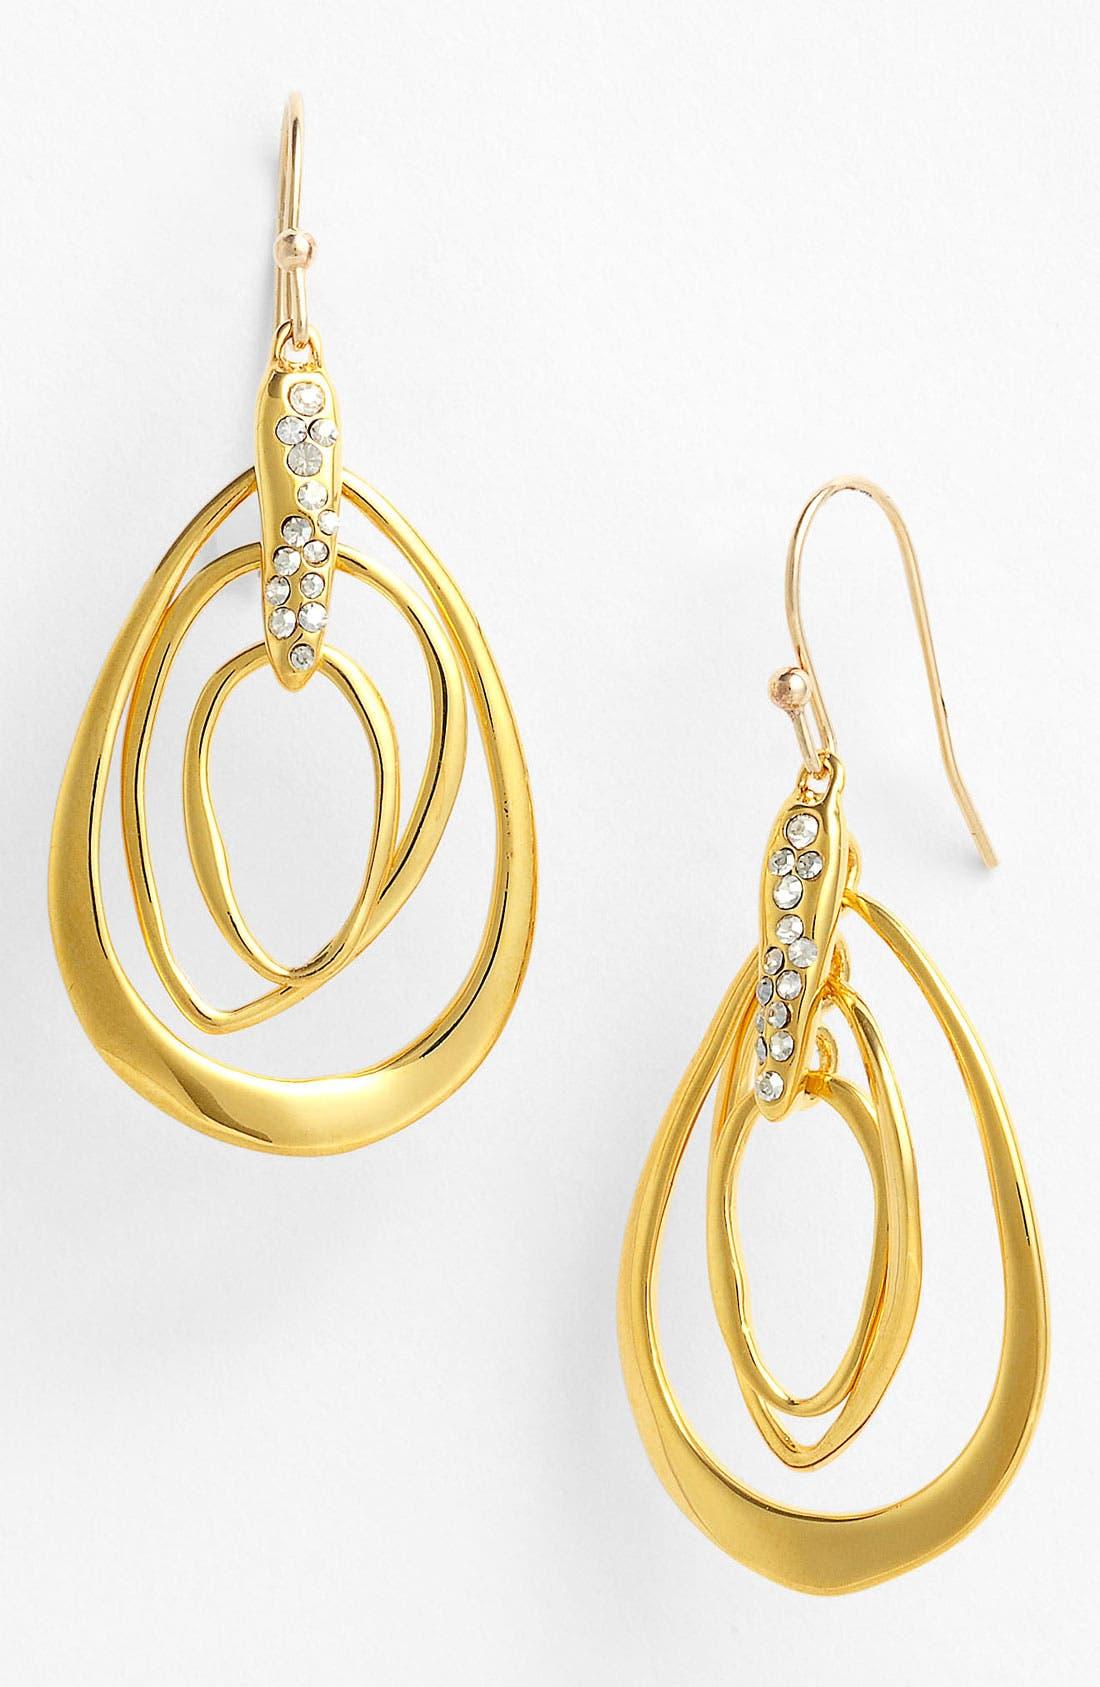 Alternate Image 1 Selected - Alexis Bittar 'Miss Havisham - New Wave' Orbiting Link Earrings